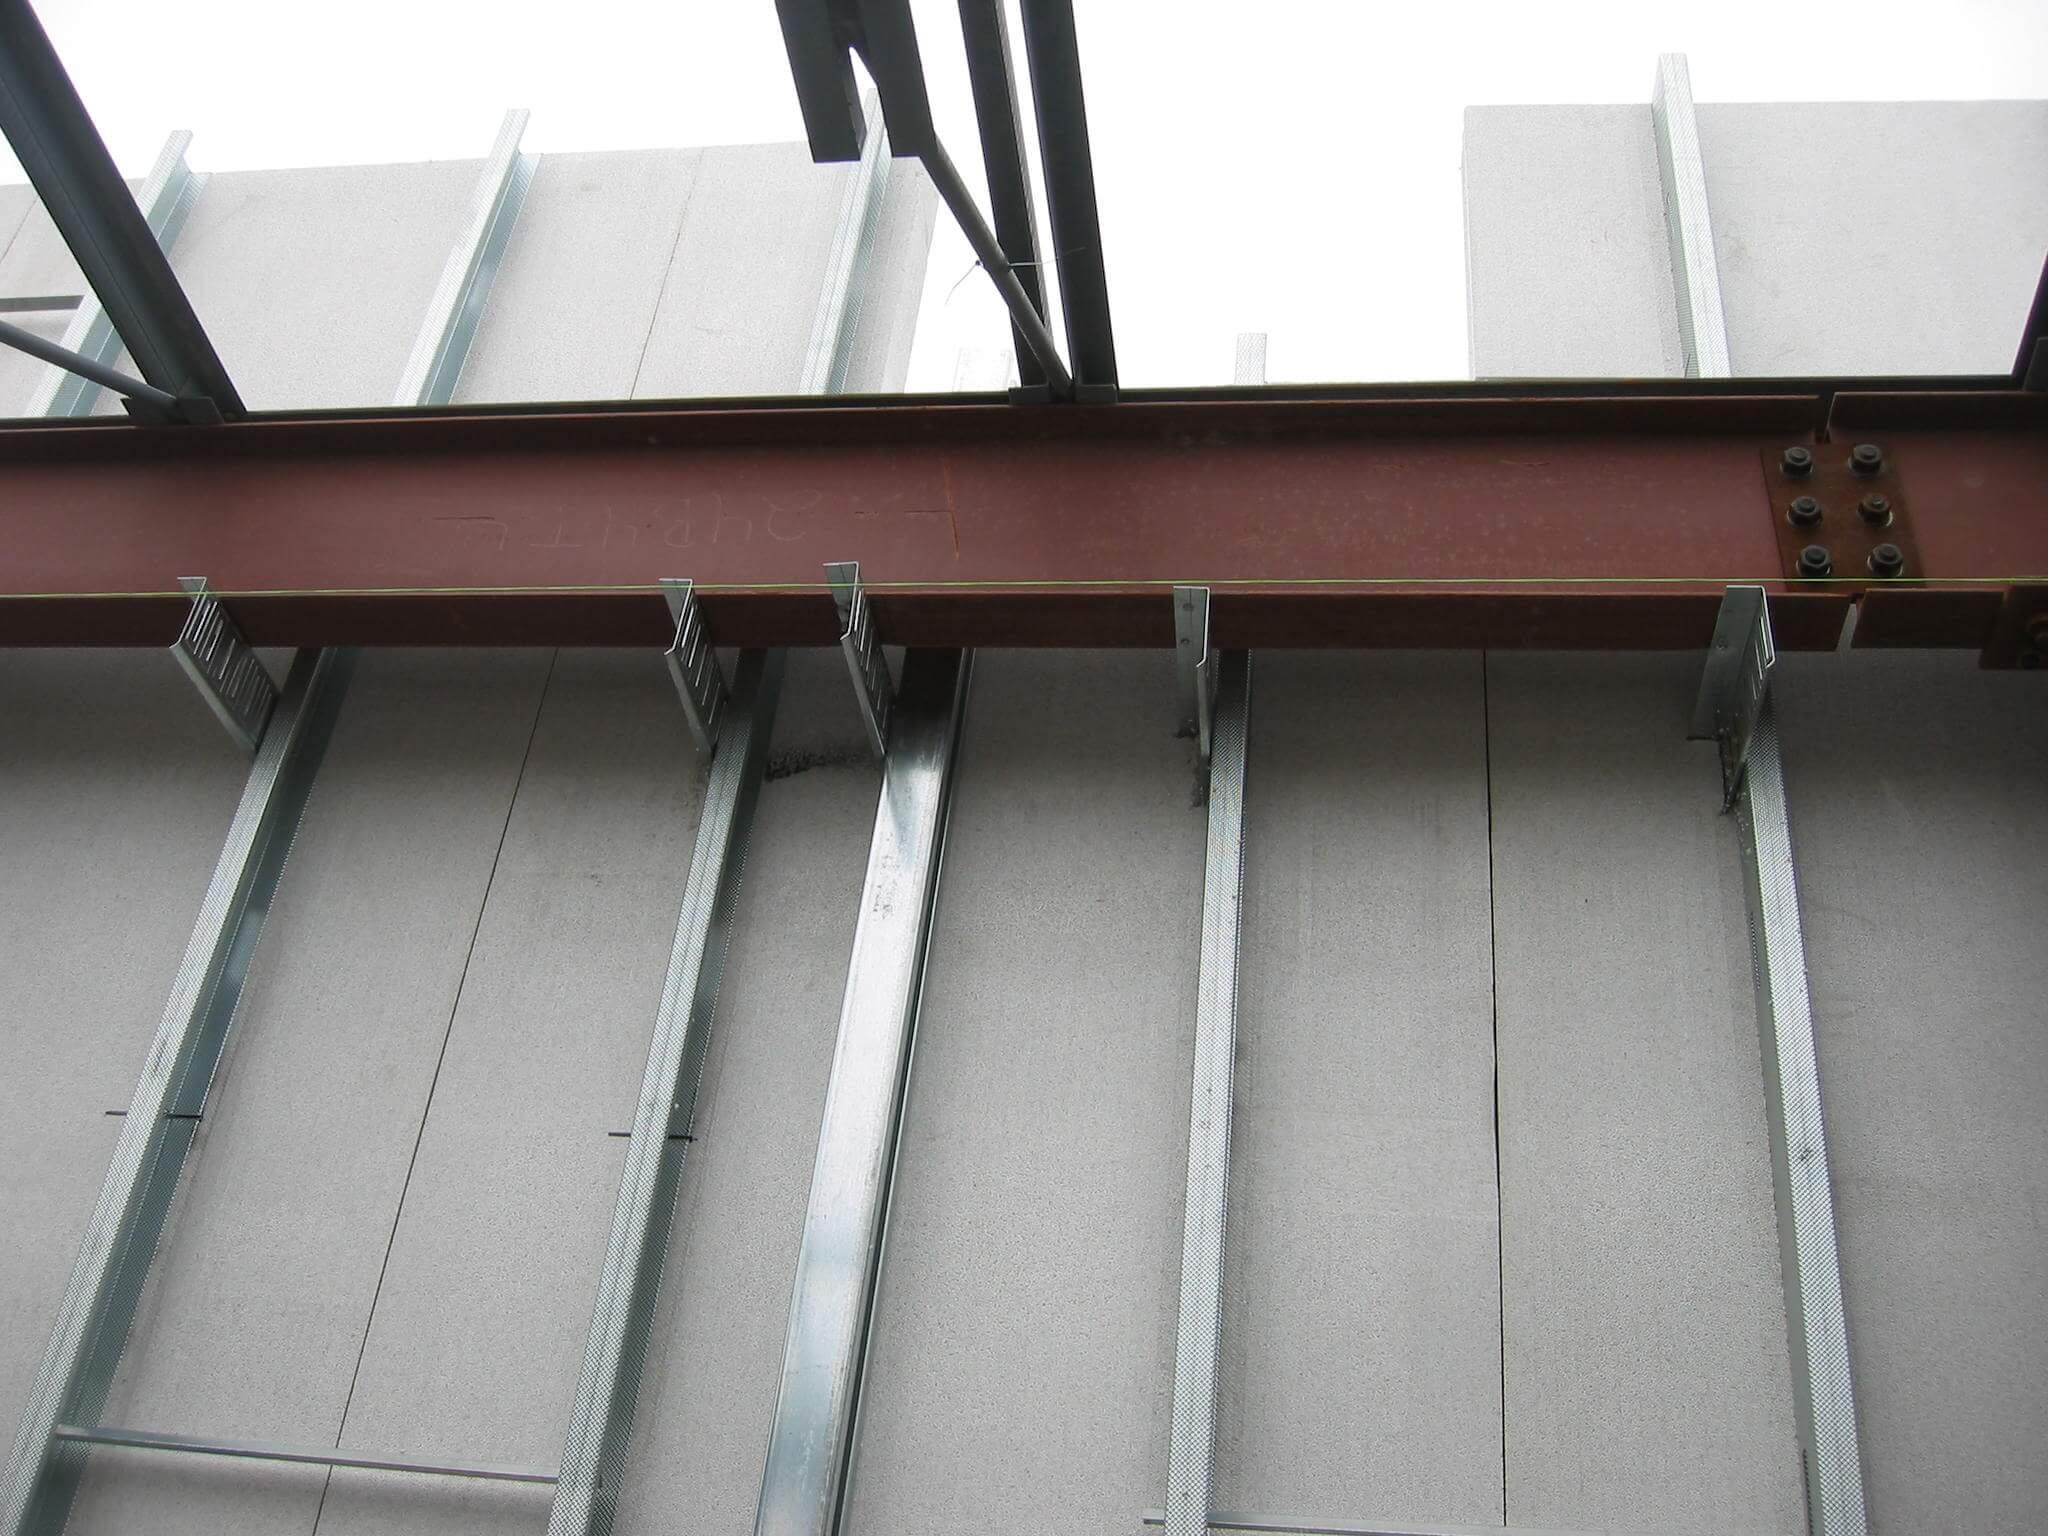 Institucional Construcción Modular – TL-TEMA 007